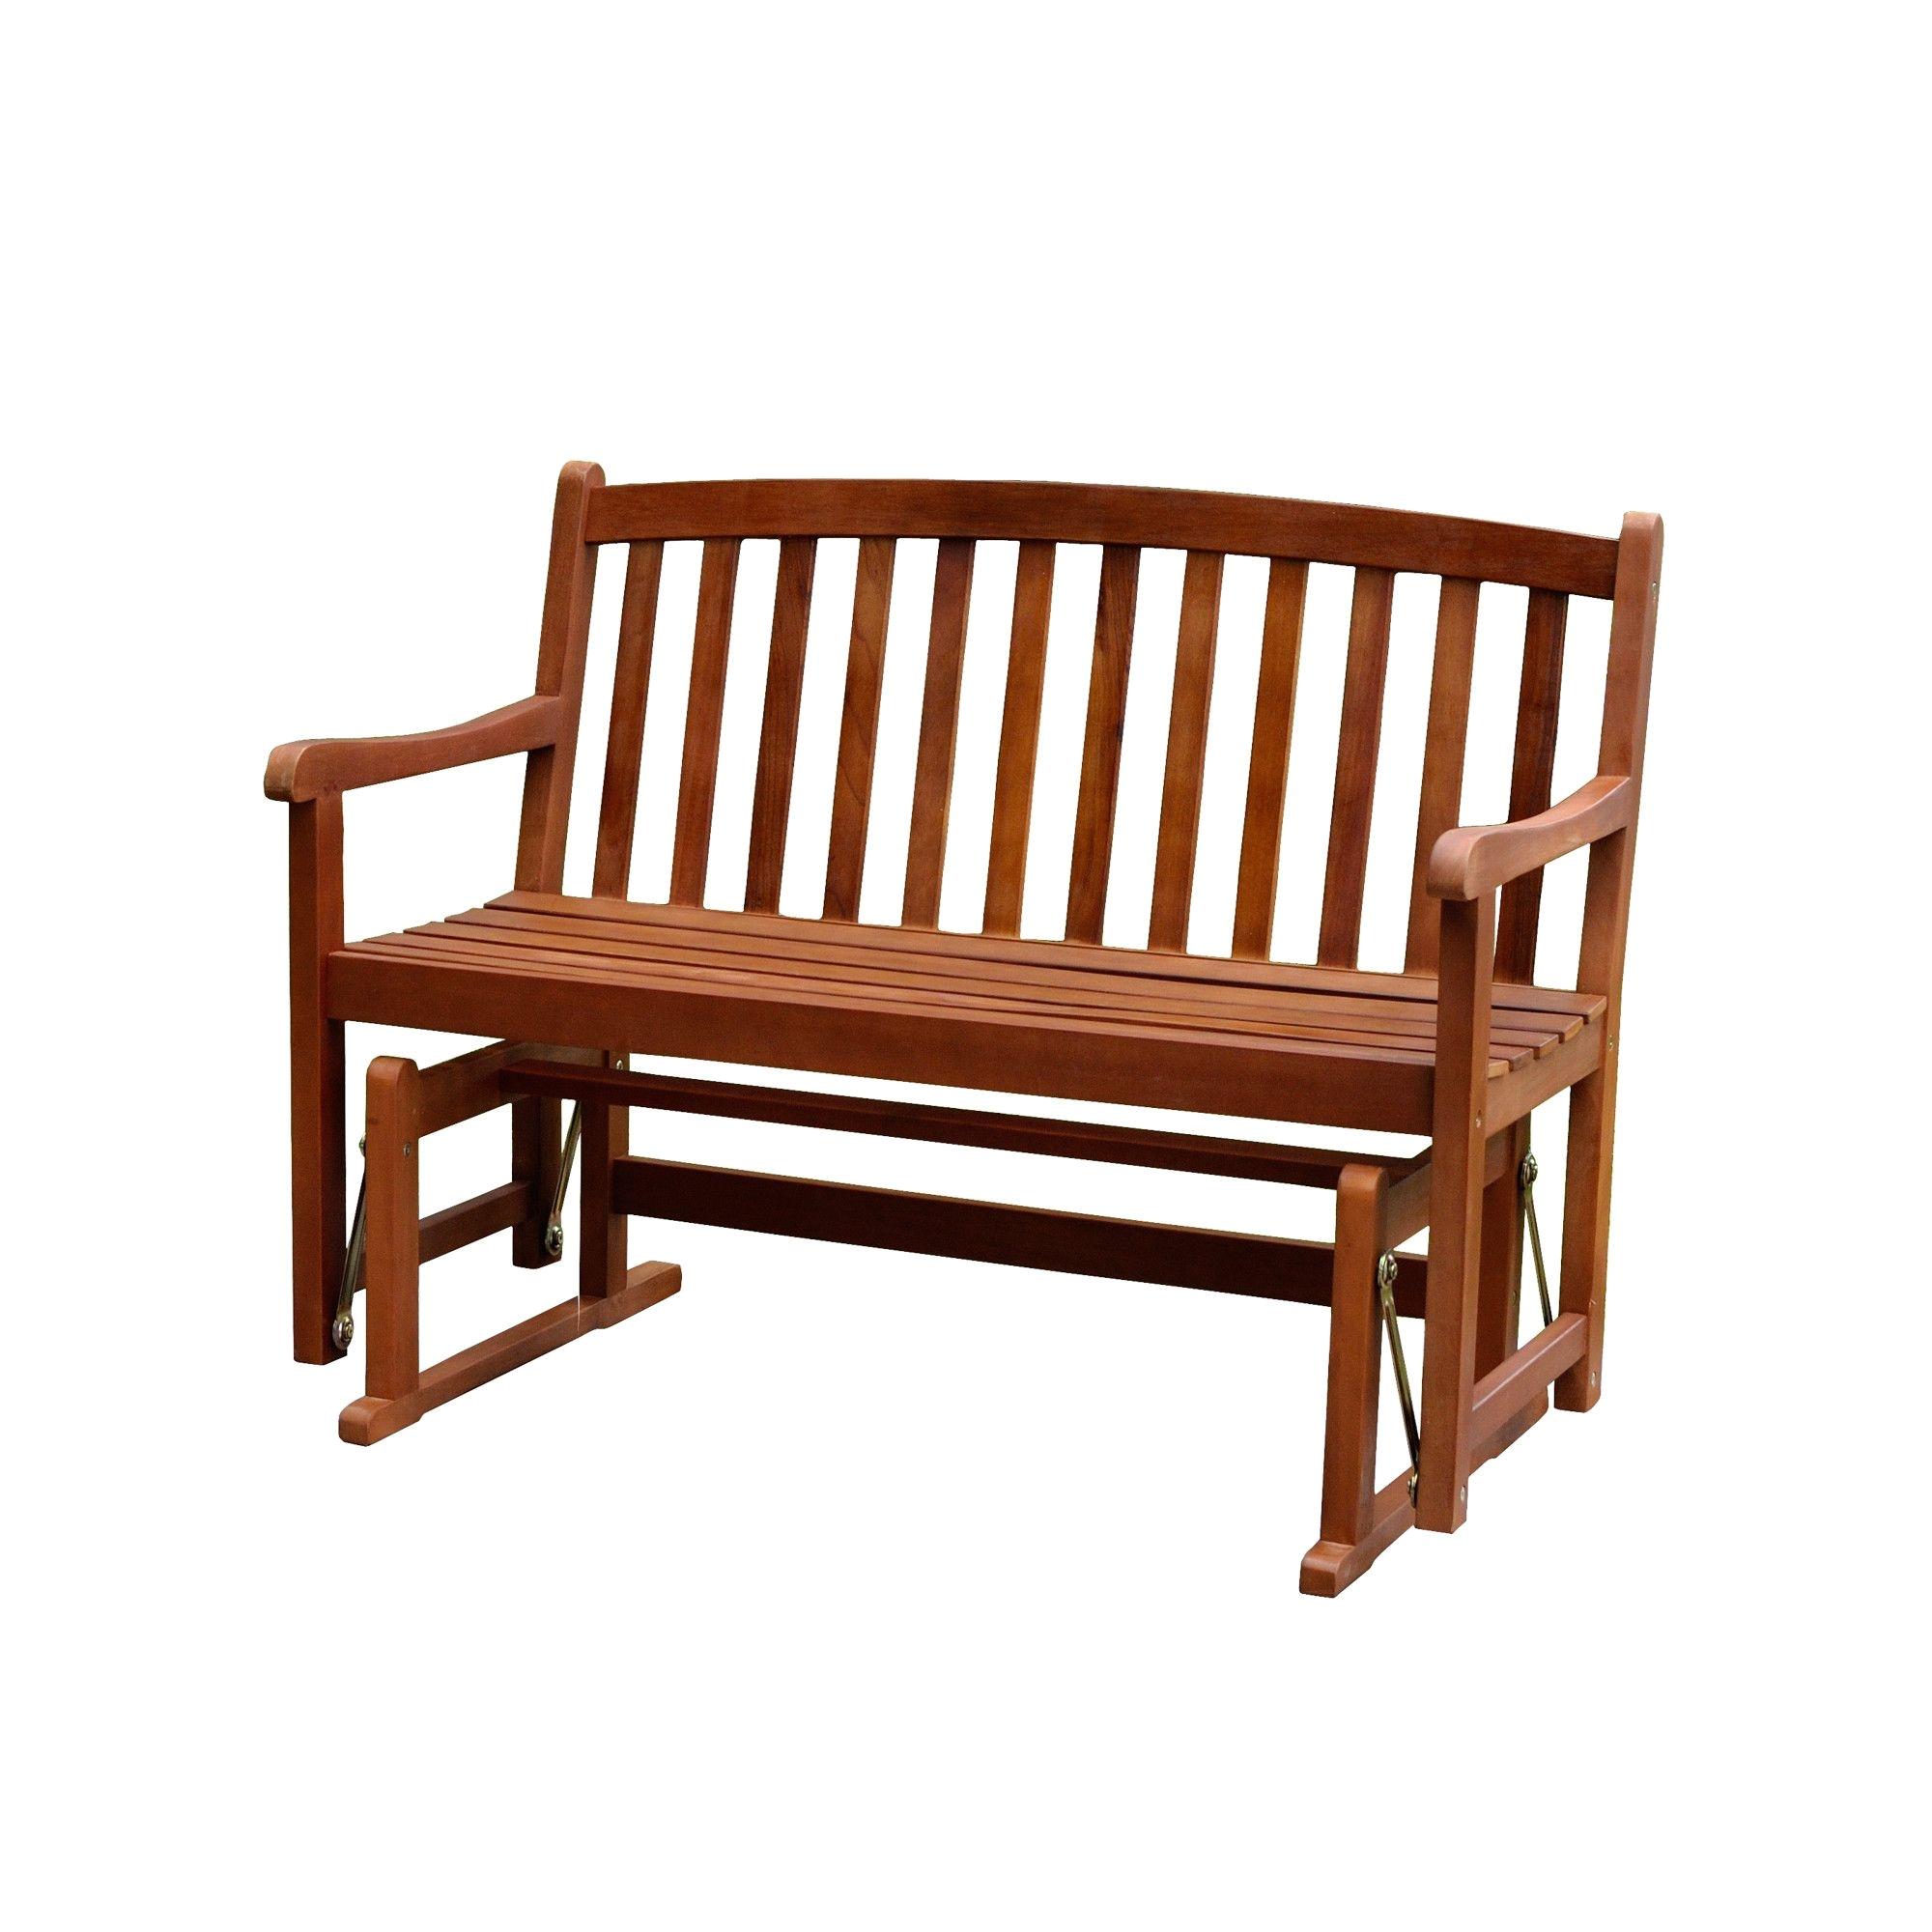 red sheda¢a¢ log bench rocker tractor supply co 1 81de f1c5e7769aef39e829b34fa